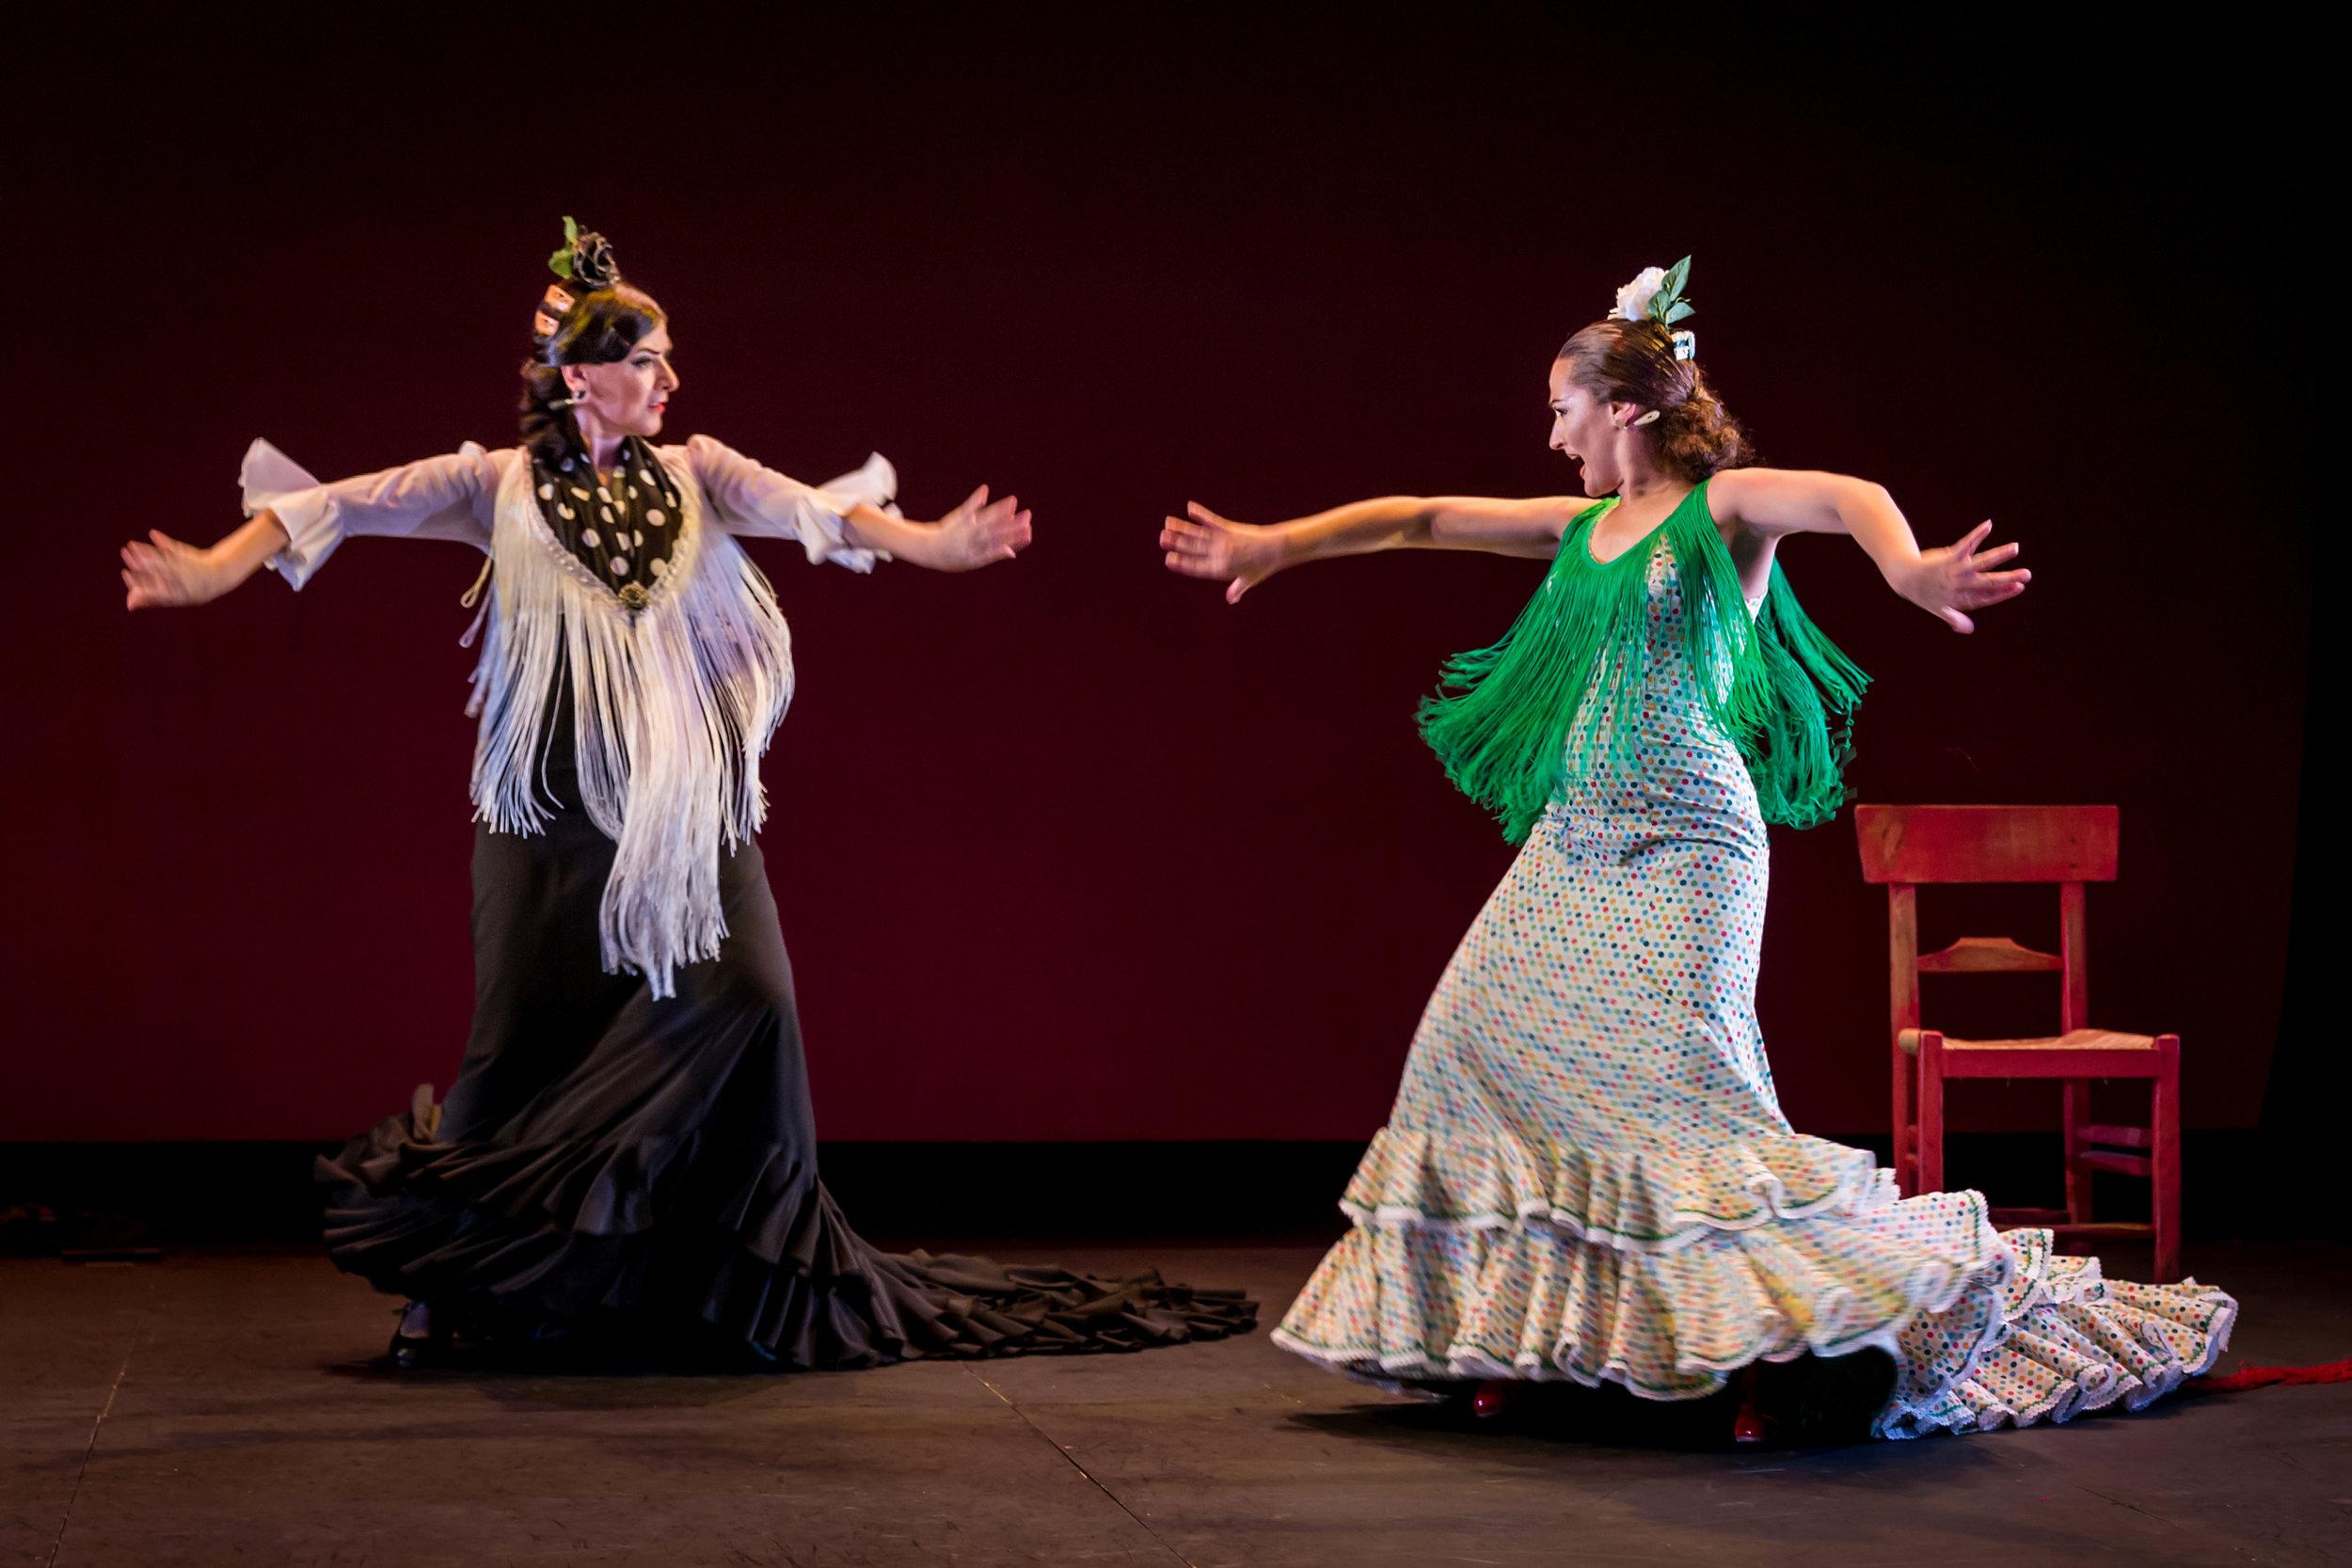 Artistic Director Carola Zertuche & Guest Dancer Adela Campallo  Foto credit: Christina Fu